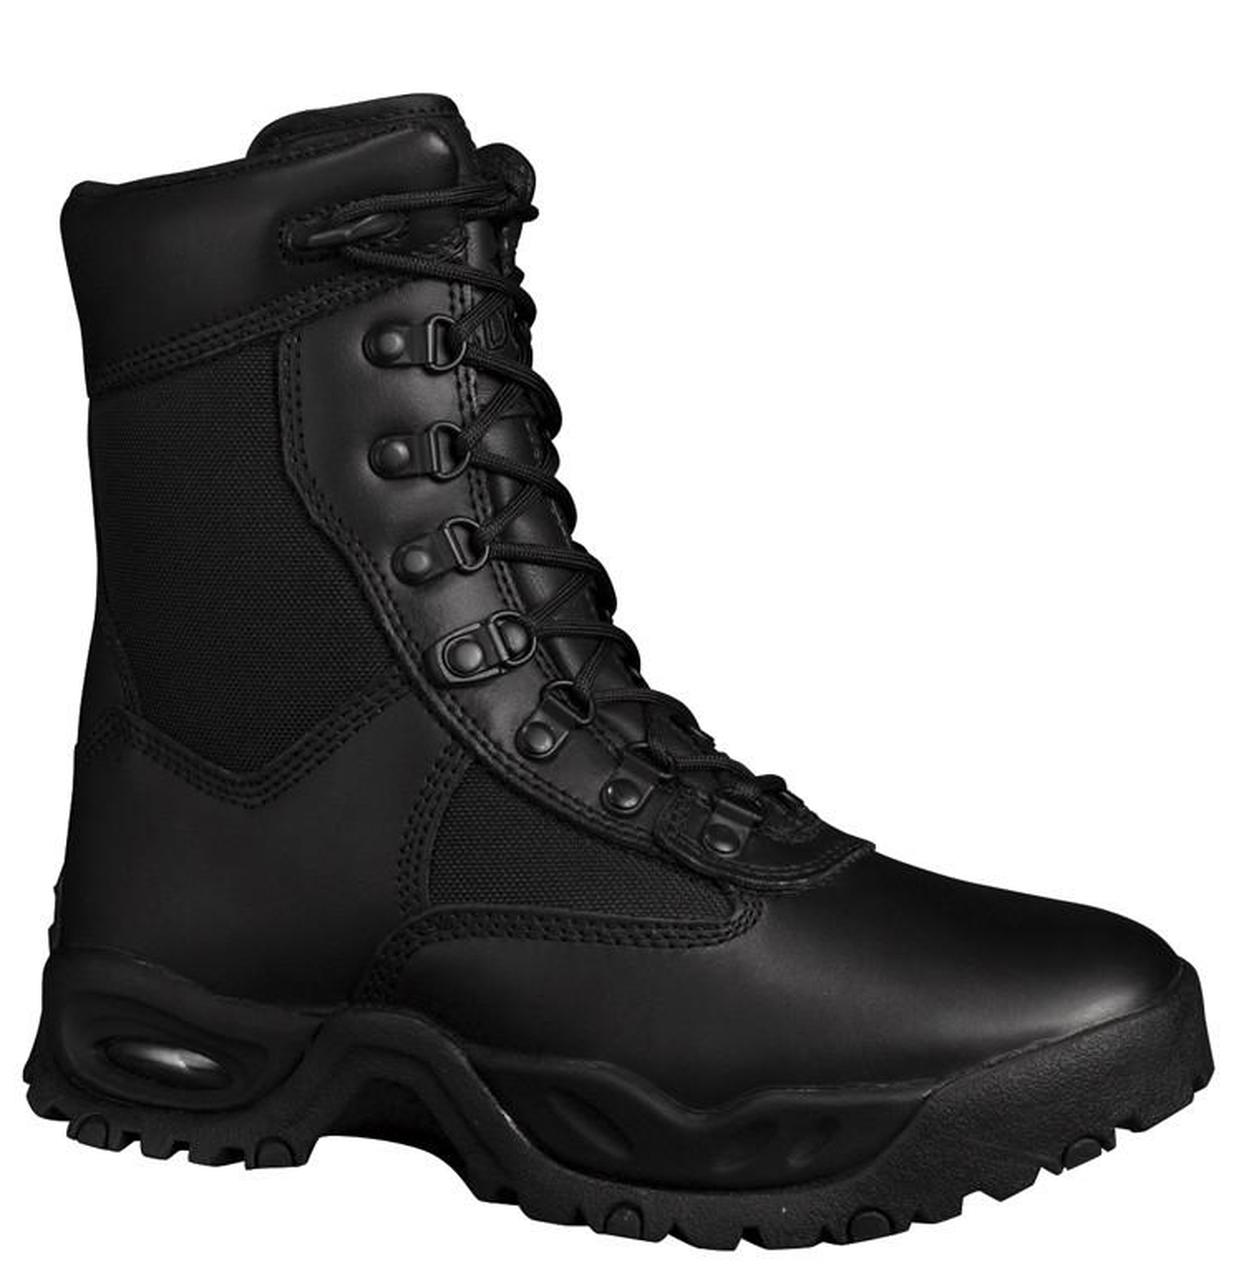 Ridge Footwear Blackhawk Air-Tac Tactical Boots